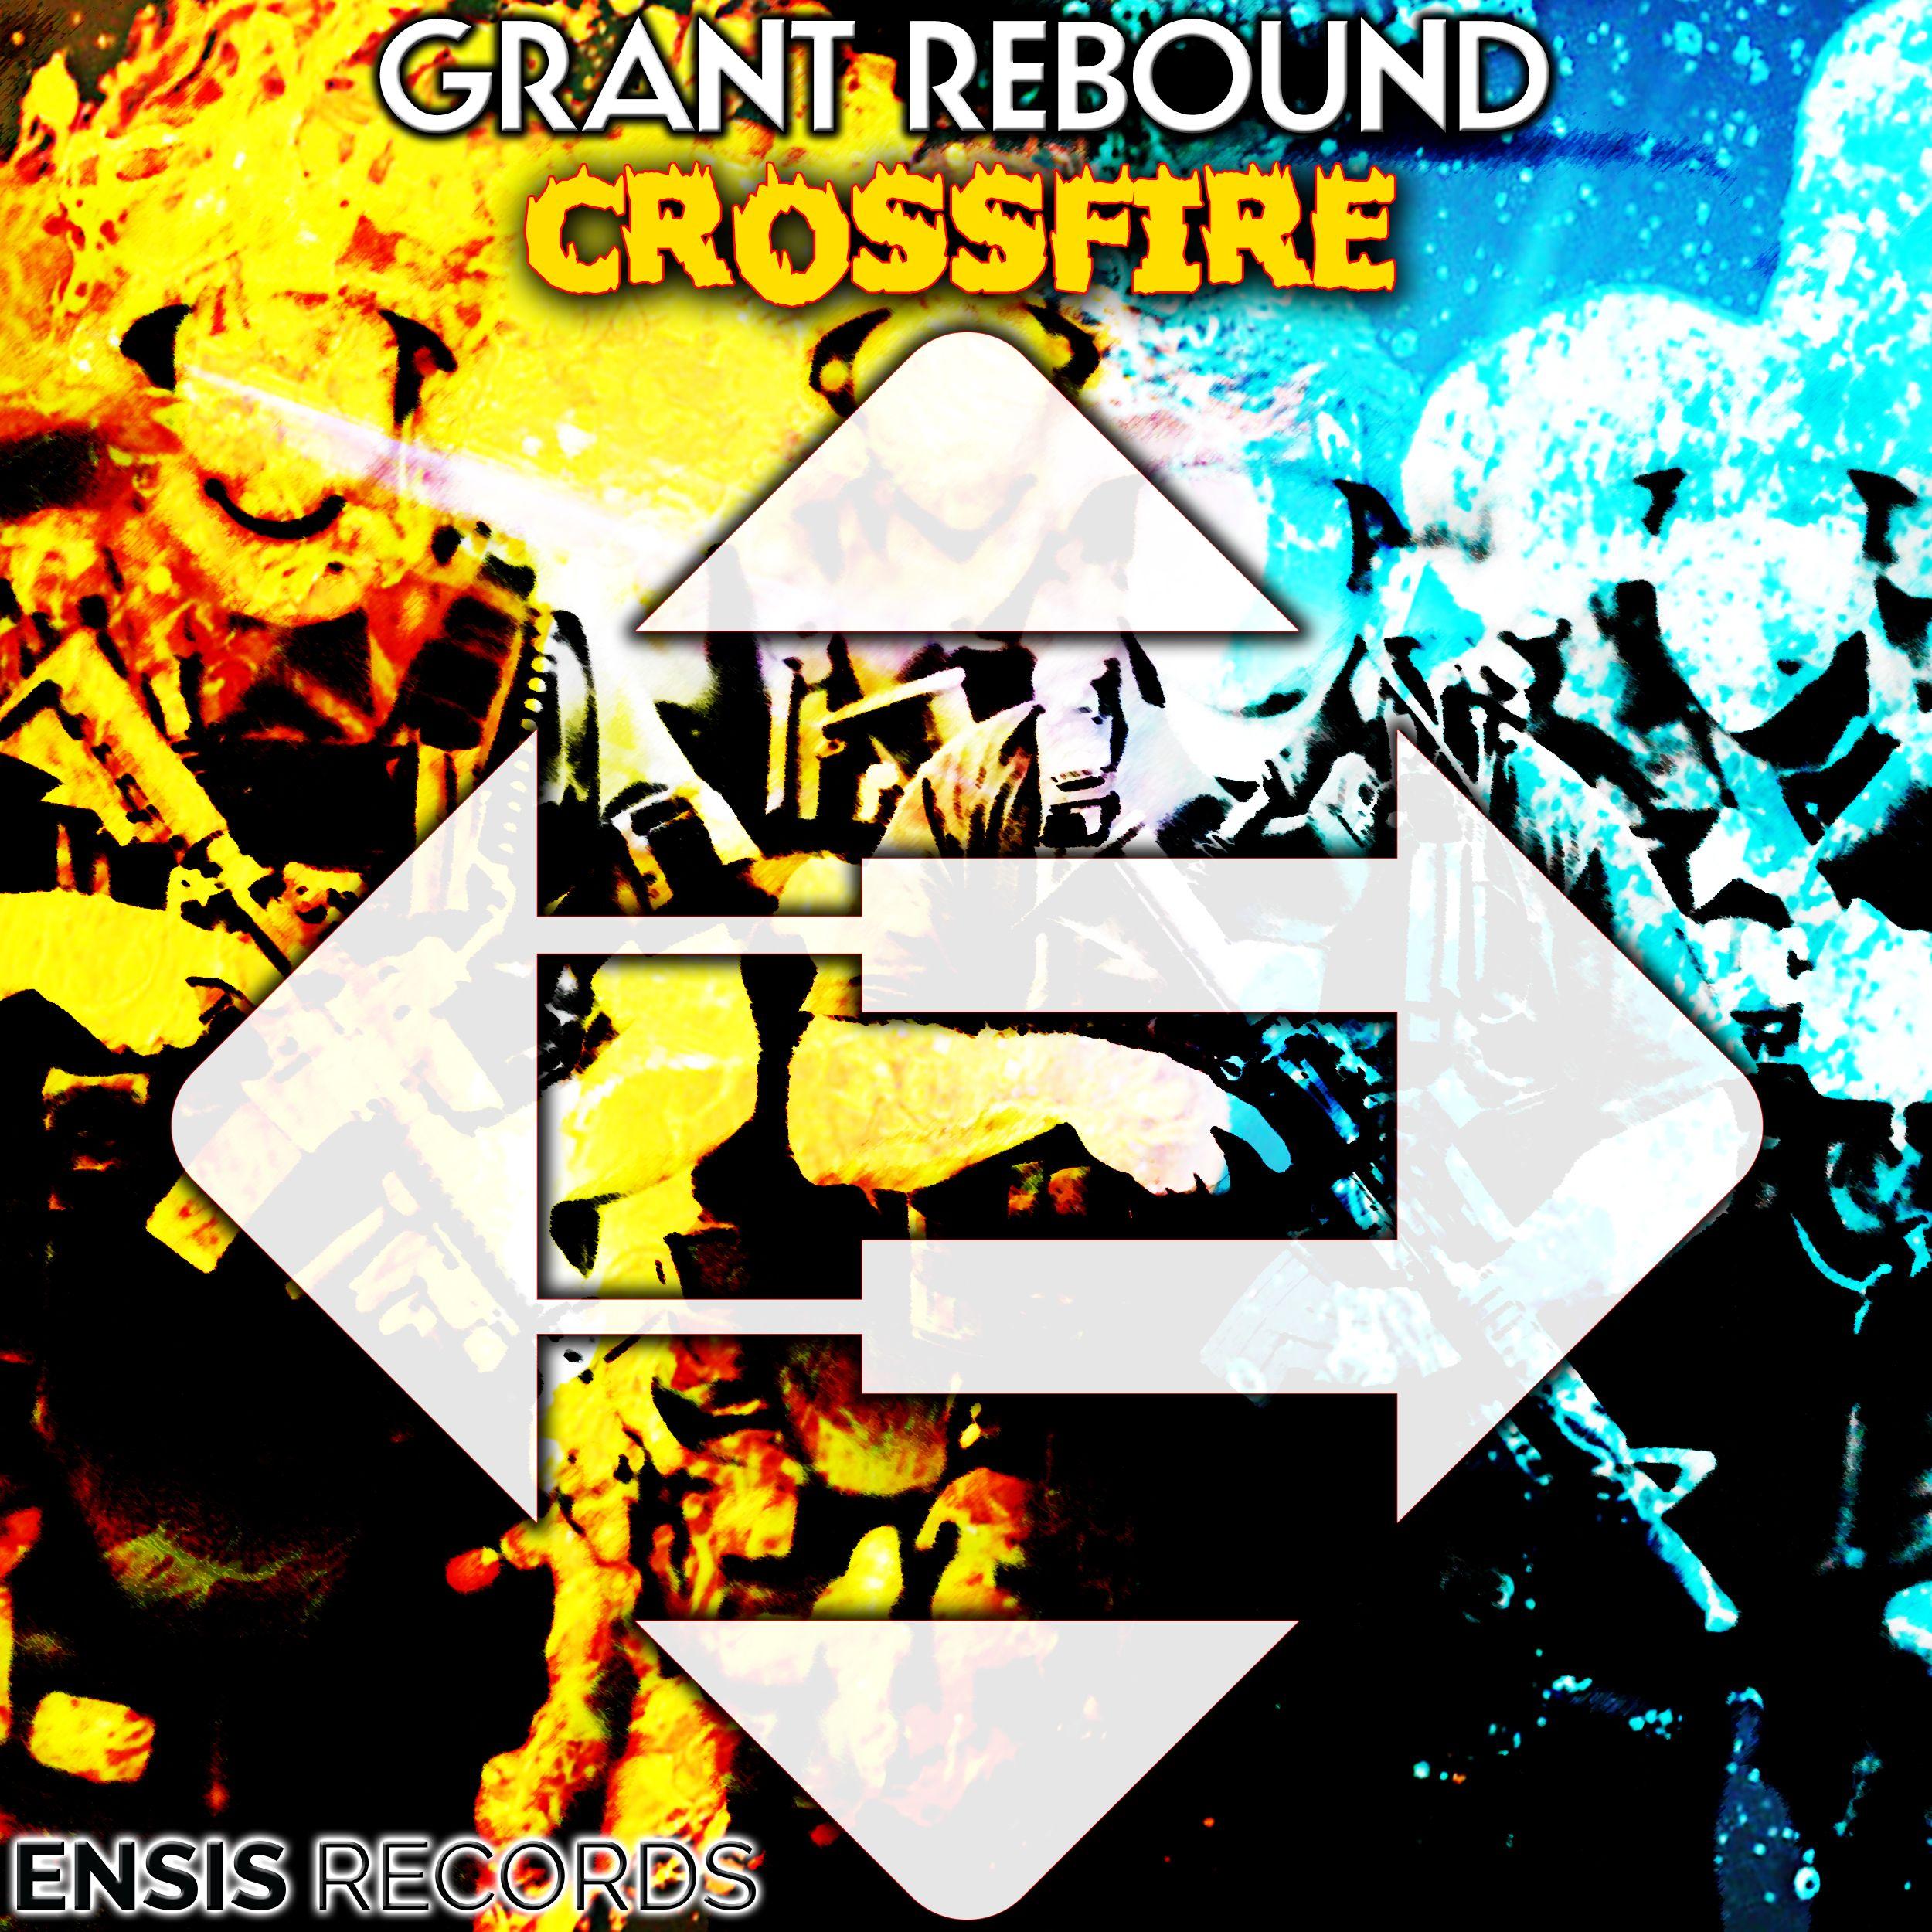 grant_rebound_-_crossfire.jpg